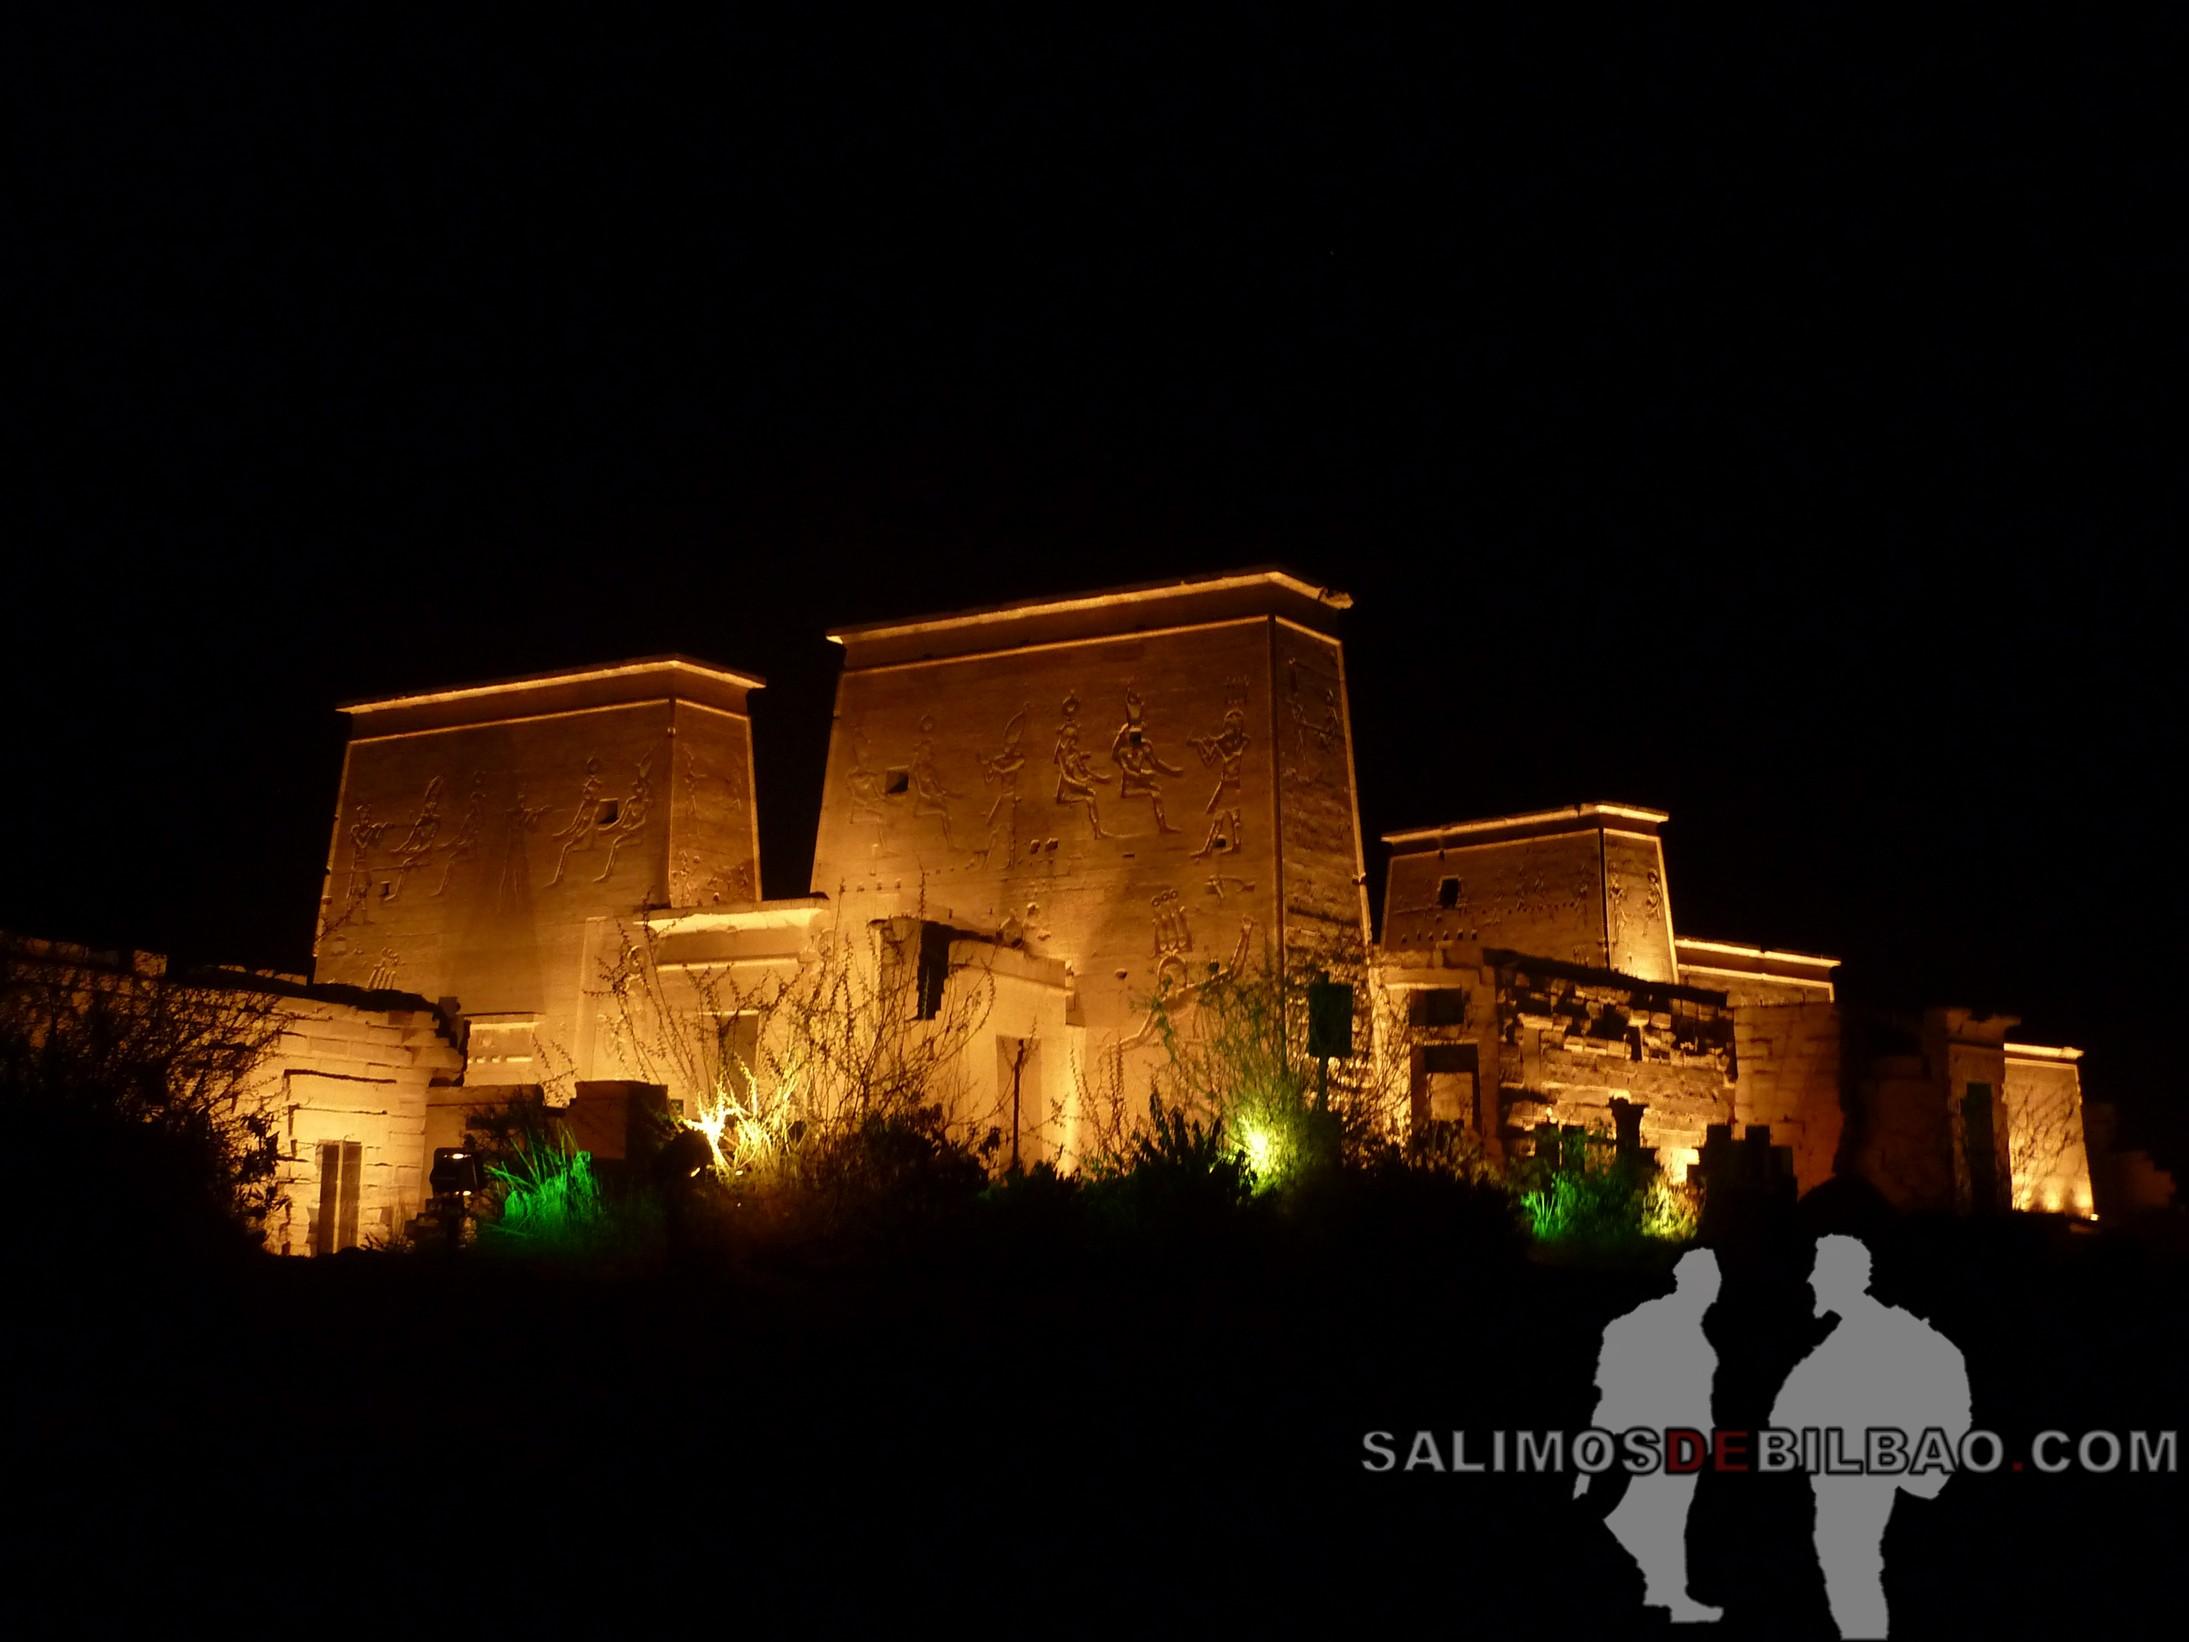 0564. Templo de Philae iluminado, Aswan